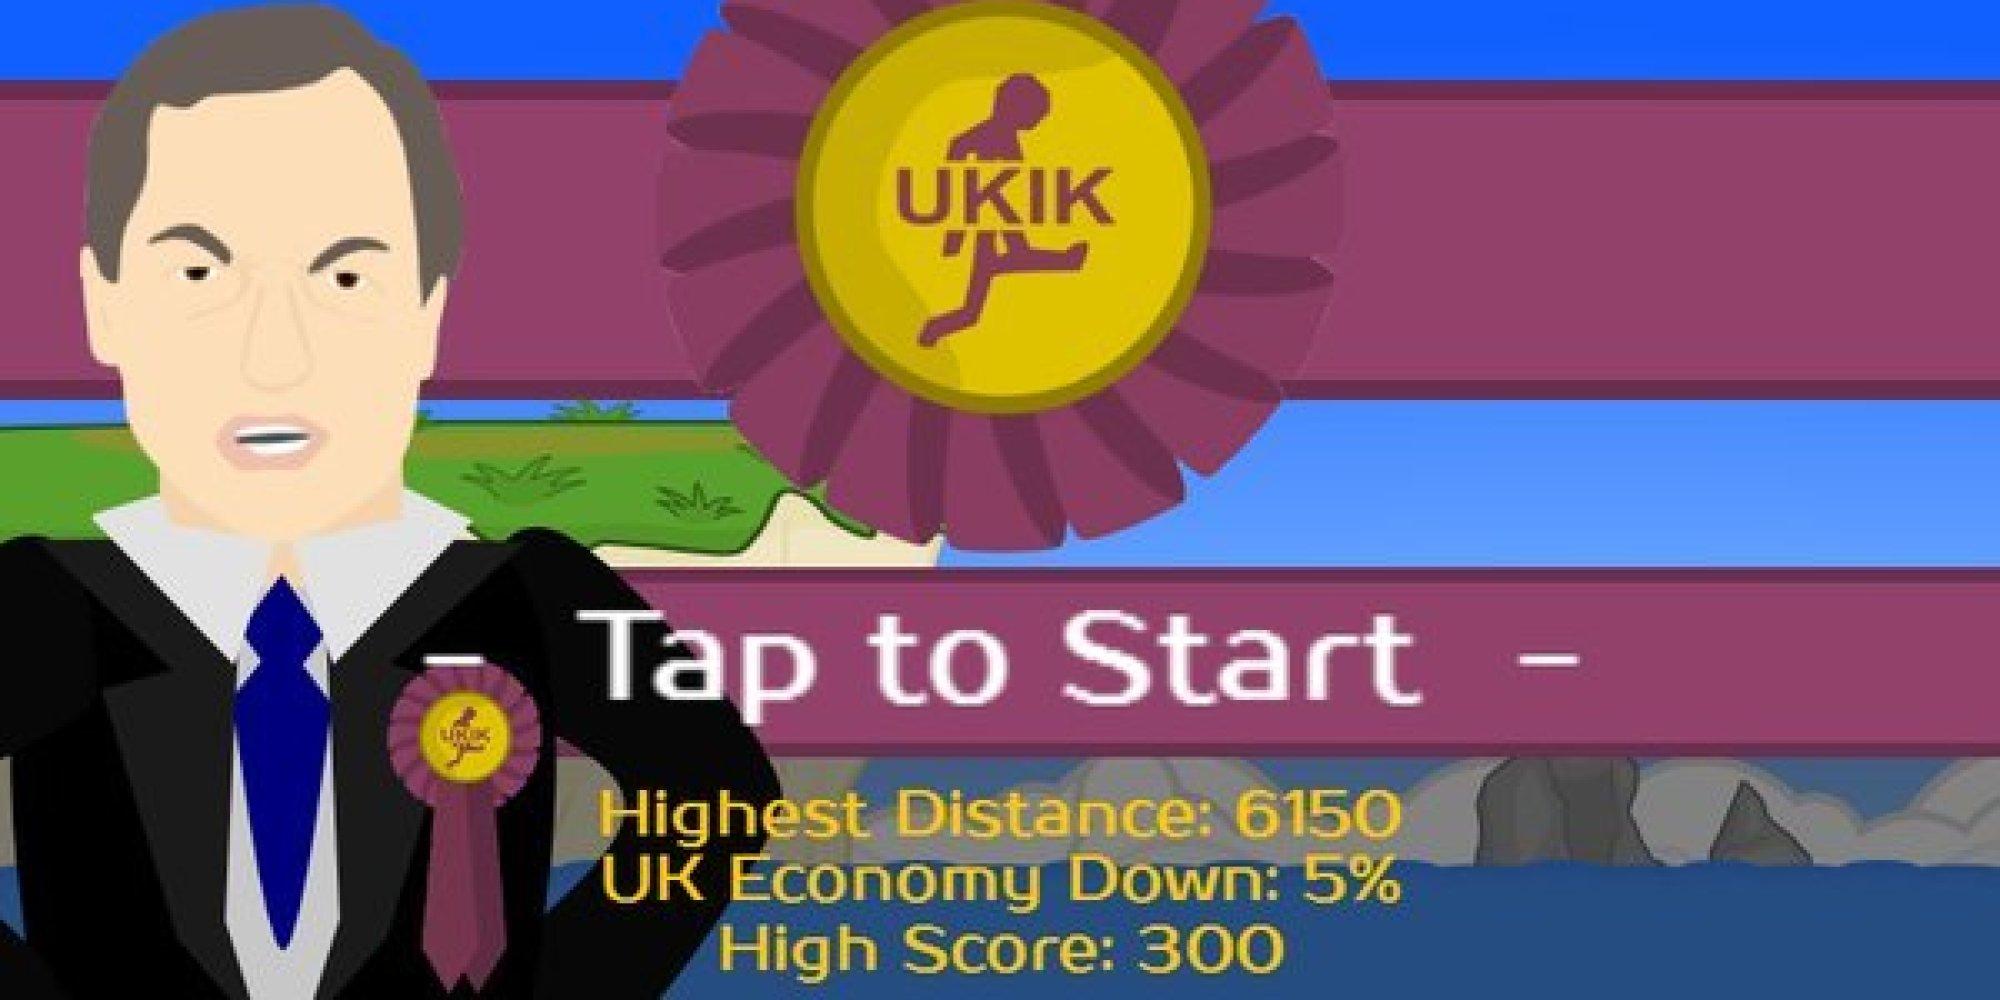 http://i.huffpost.com/gen/2419250/thumbs/o-NIGEL-FARAGE-UKIK-UKIP-facebook.jpg